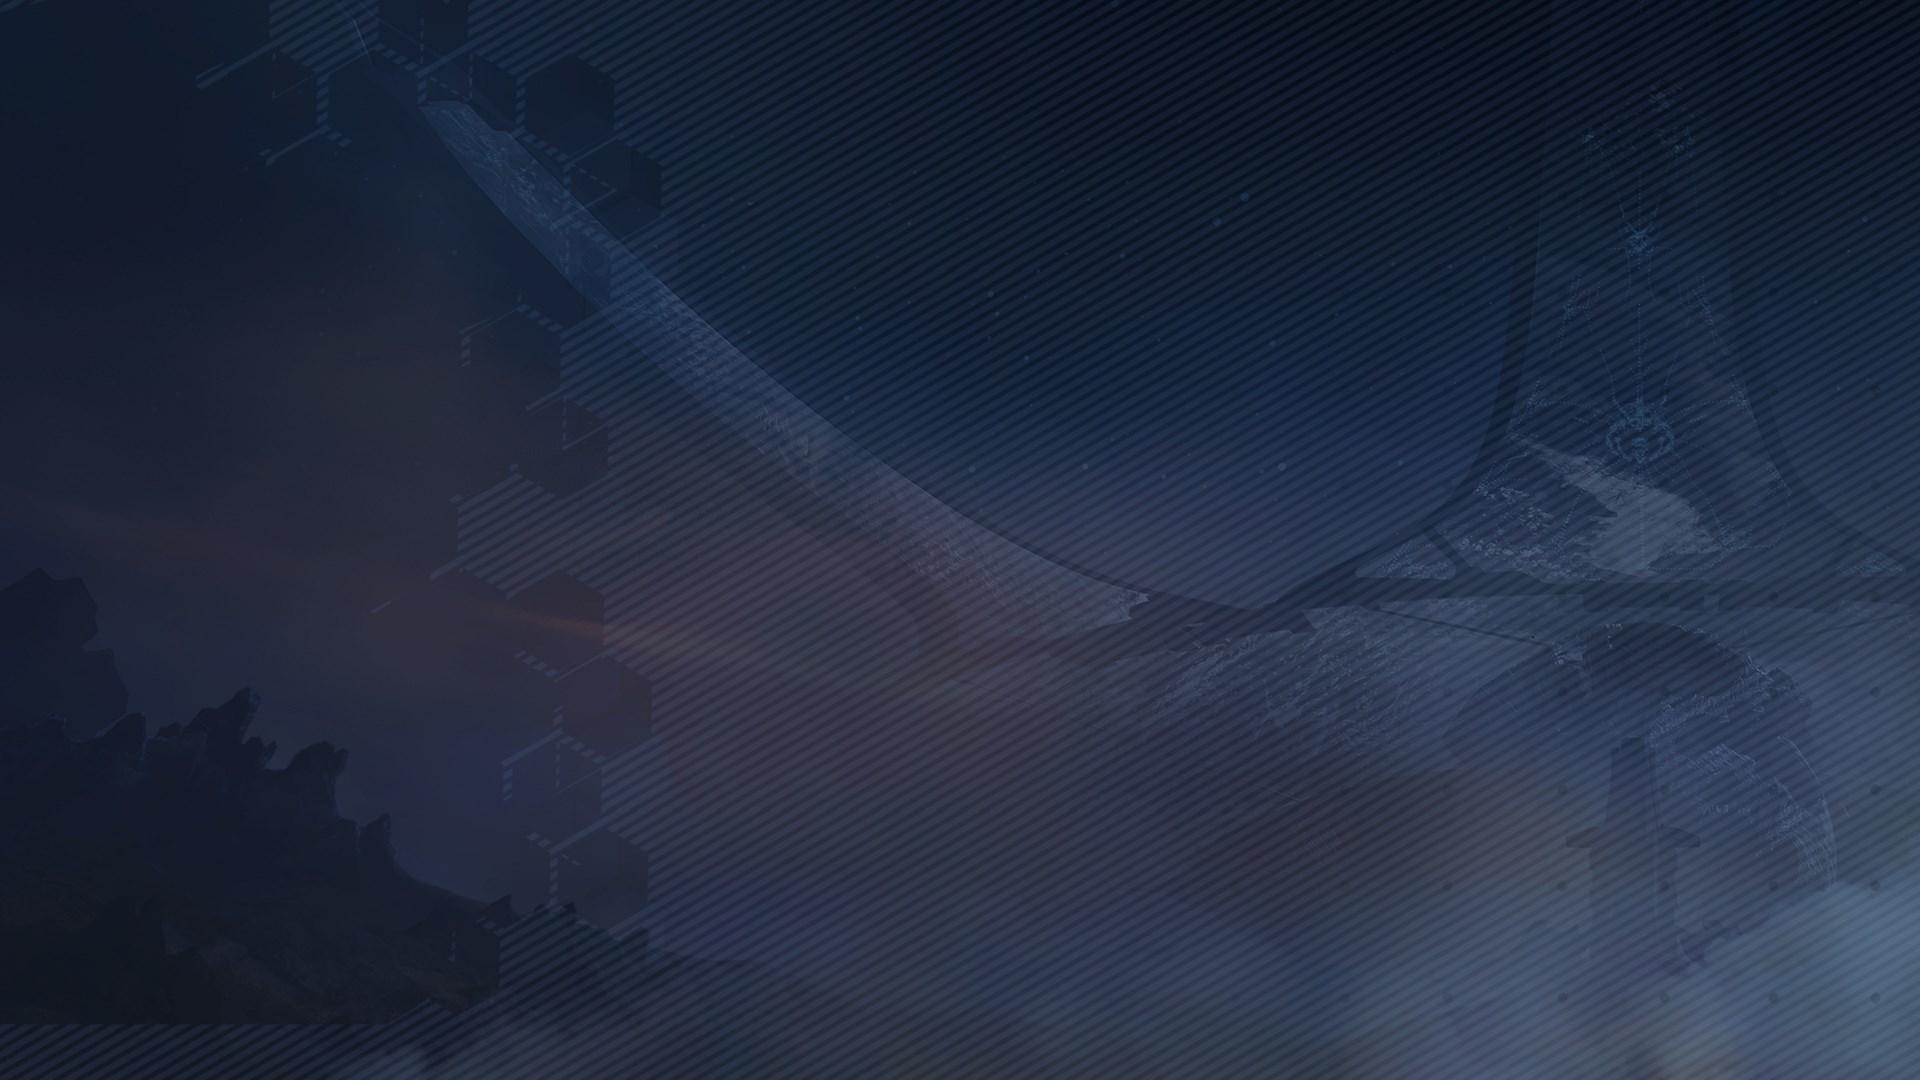 Halo Wars 2: 9 packs del modo Blitz + 1 gratis